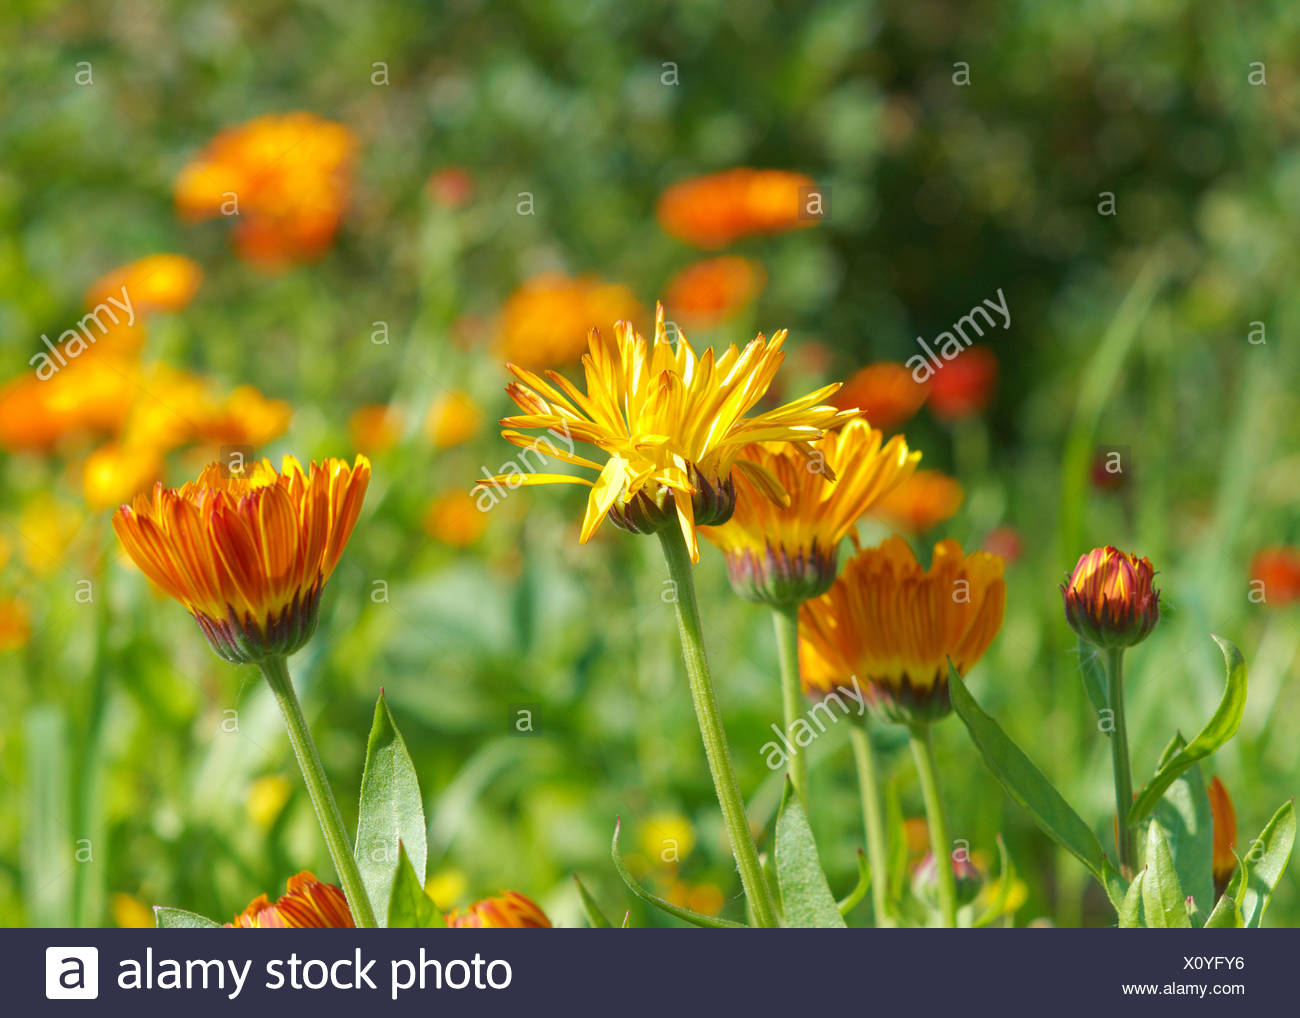 pot marigold (Calendula officinalis) fiel - Stock Image